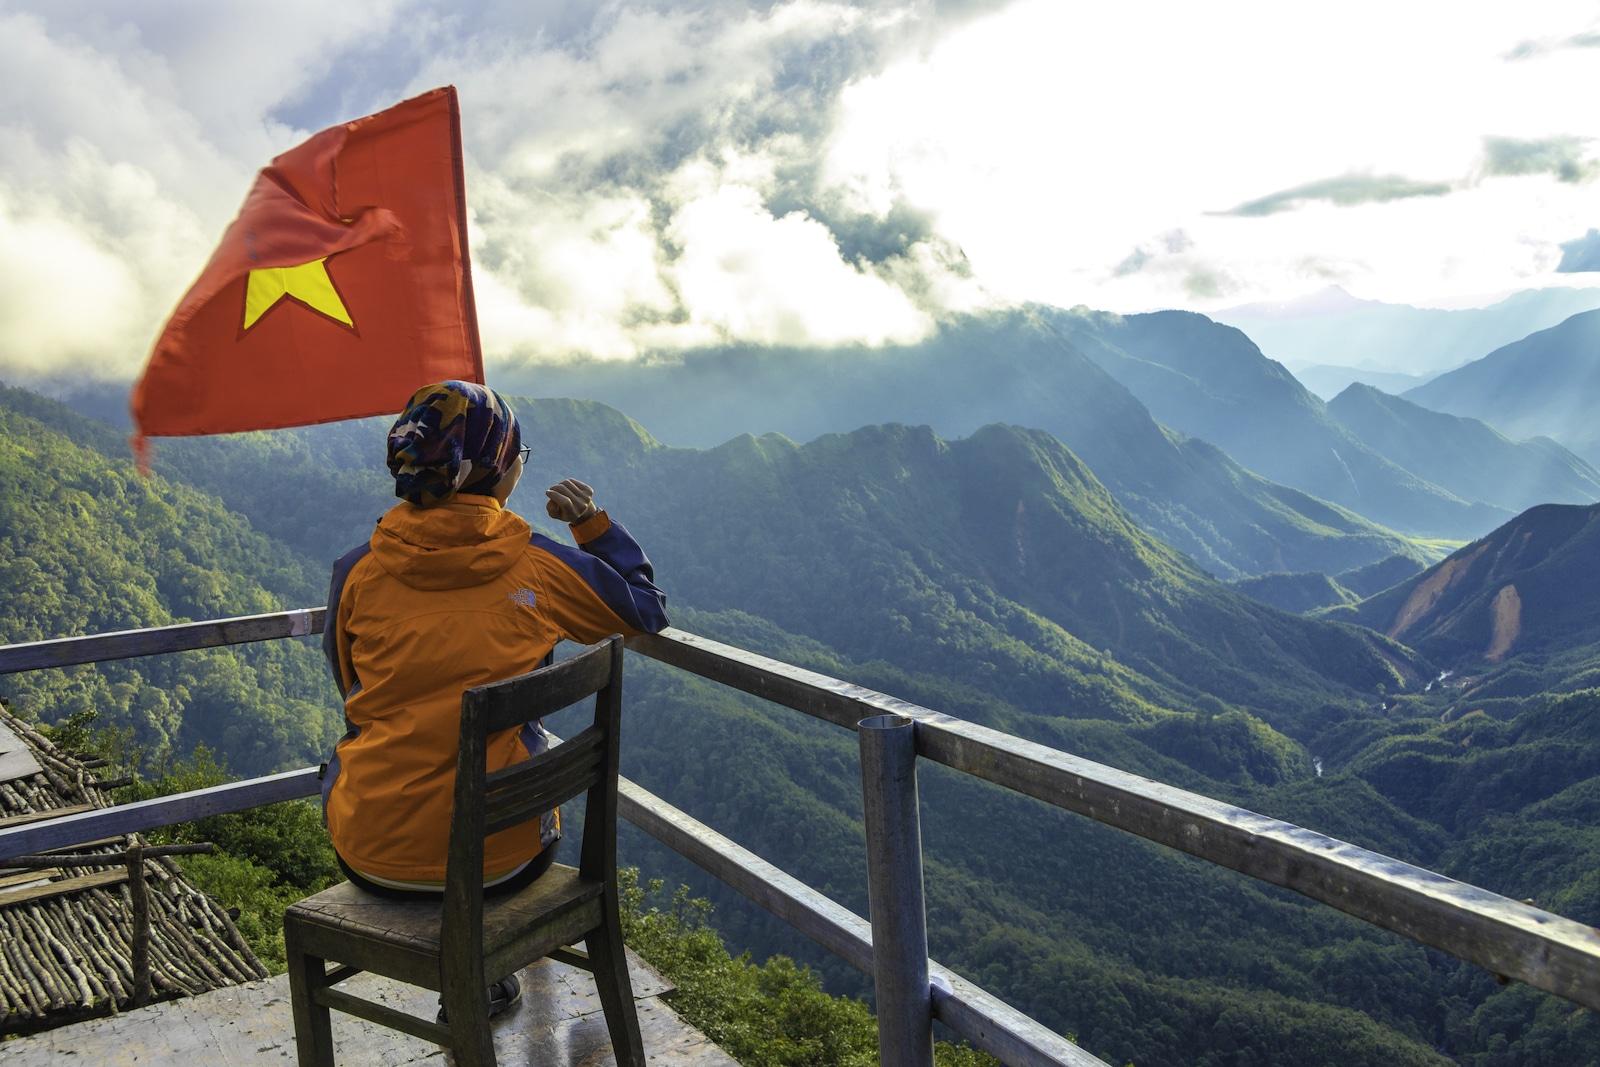 Sapa Vietnam Flag and Mountain